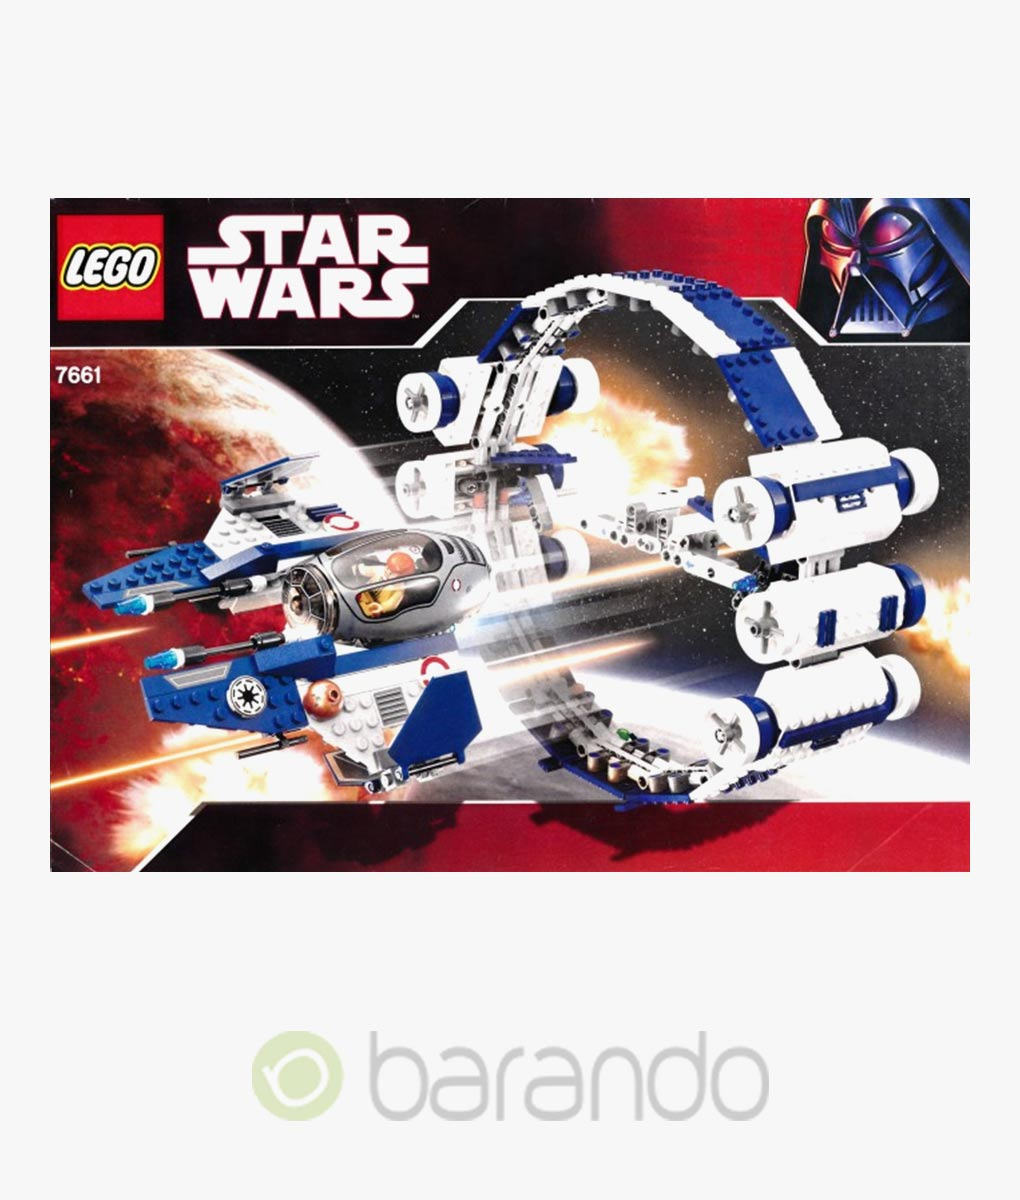 LEGO Star Wars 7661 Jedi Starfighter Set